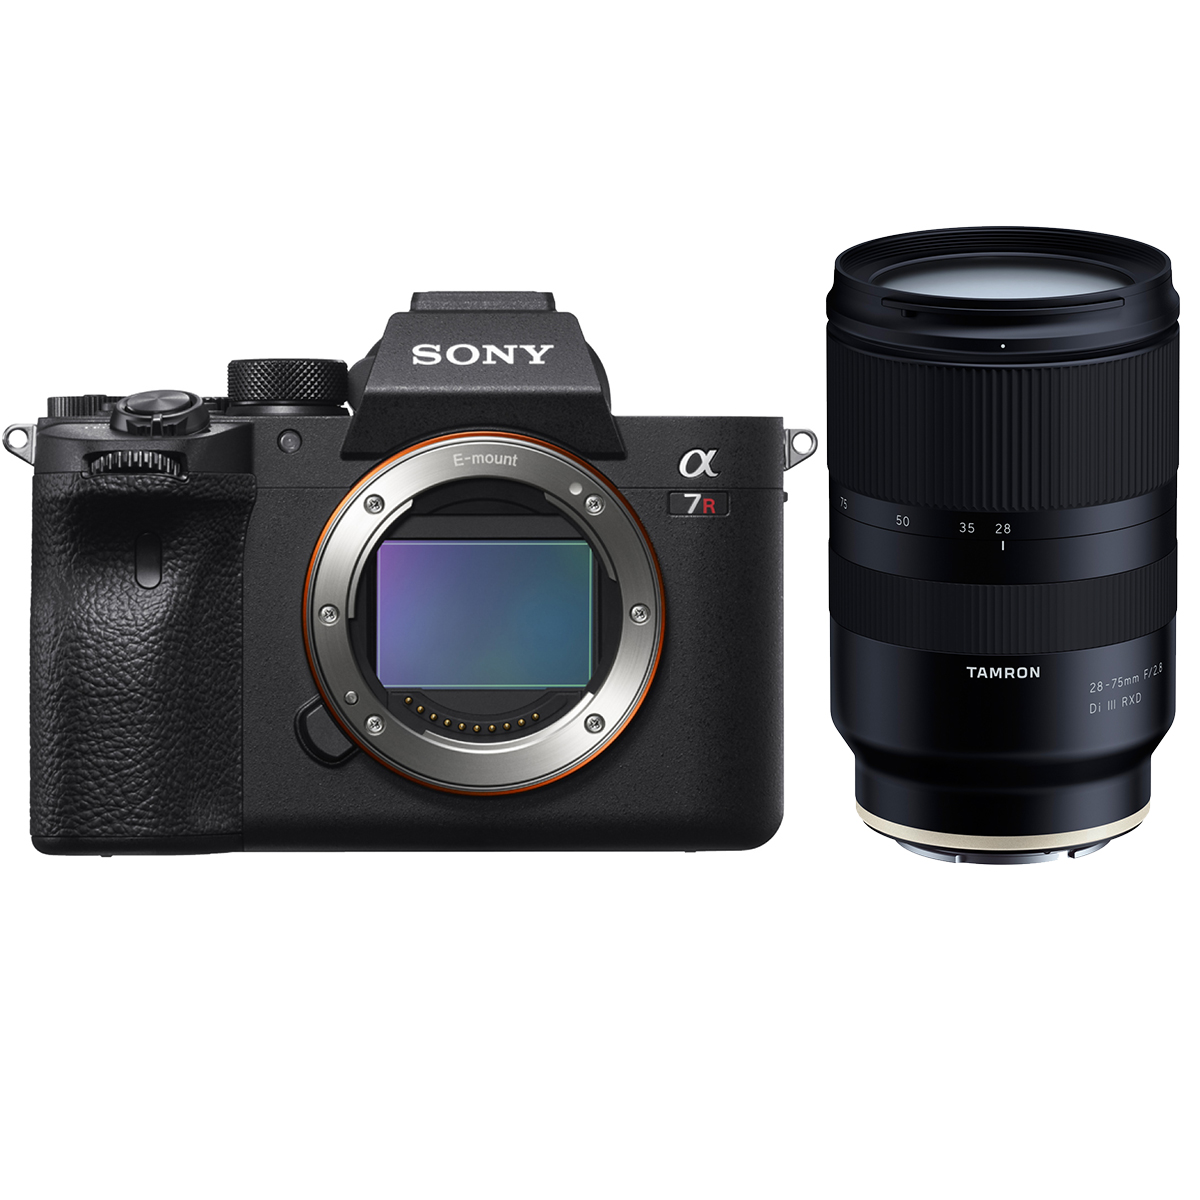 Sony Alpha 7R III + Tamron 28-75mm 1:2,8 Di III RXD